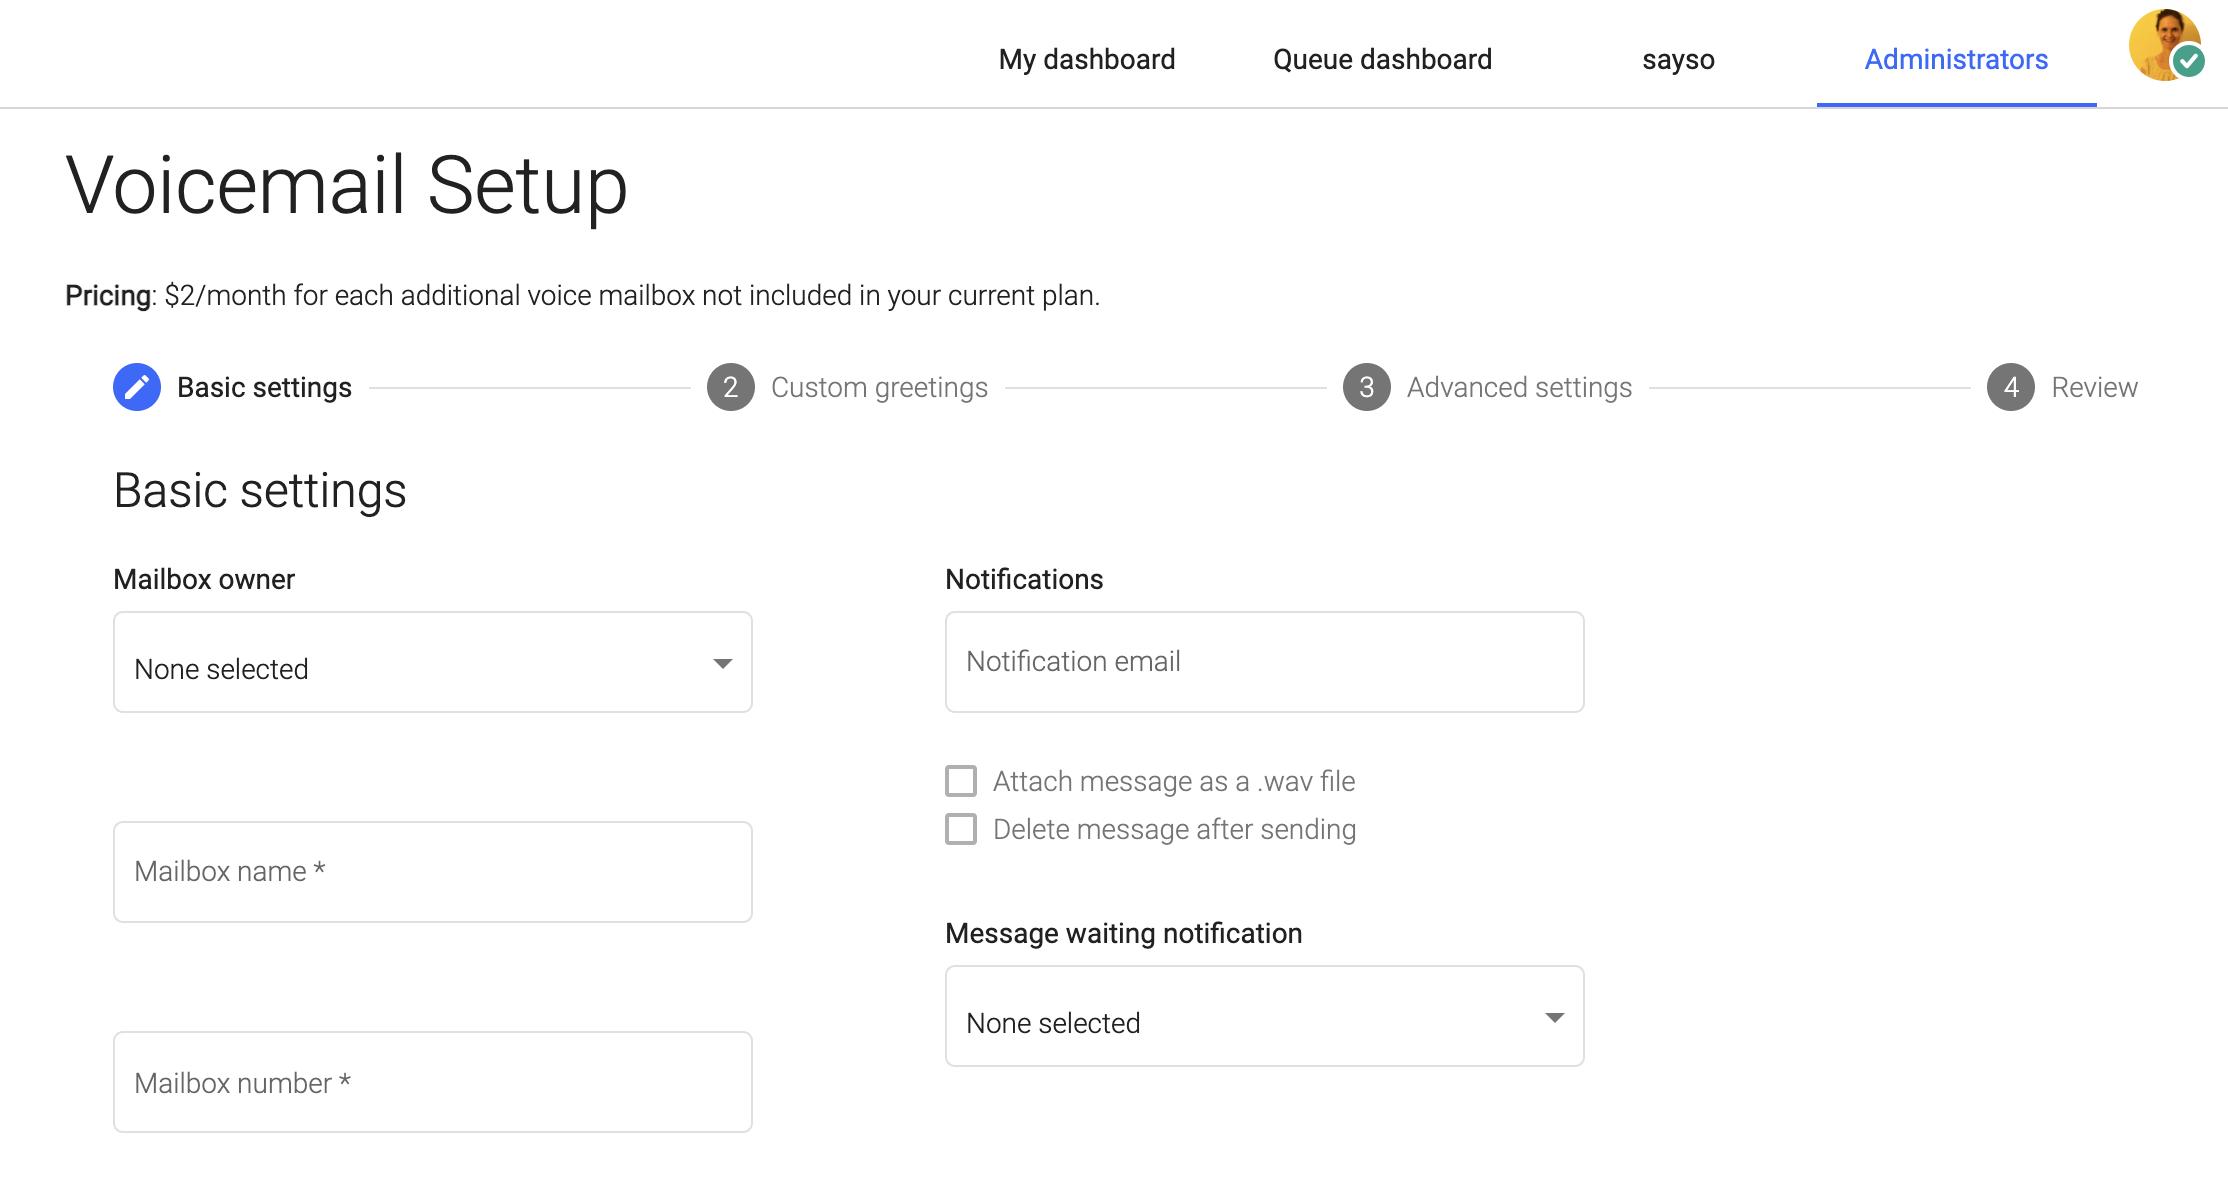 Screenshot of OnSIP's new web app admin portal, voicemail setup